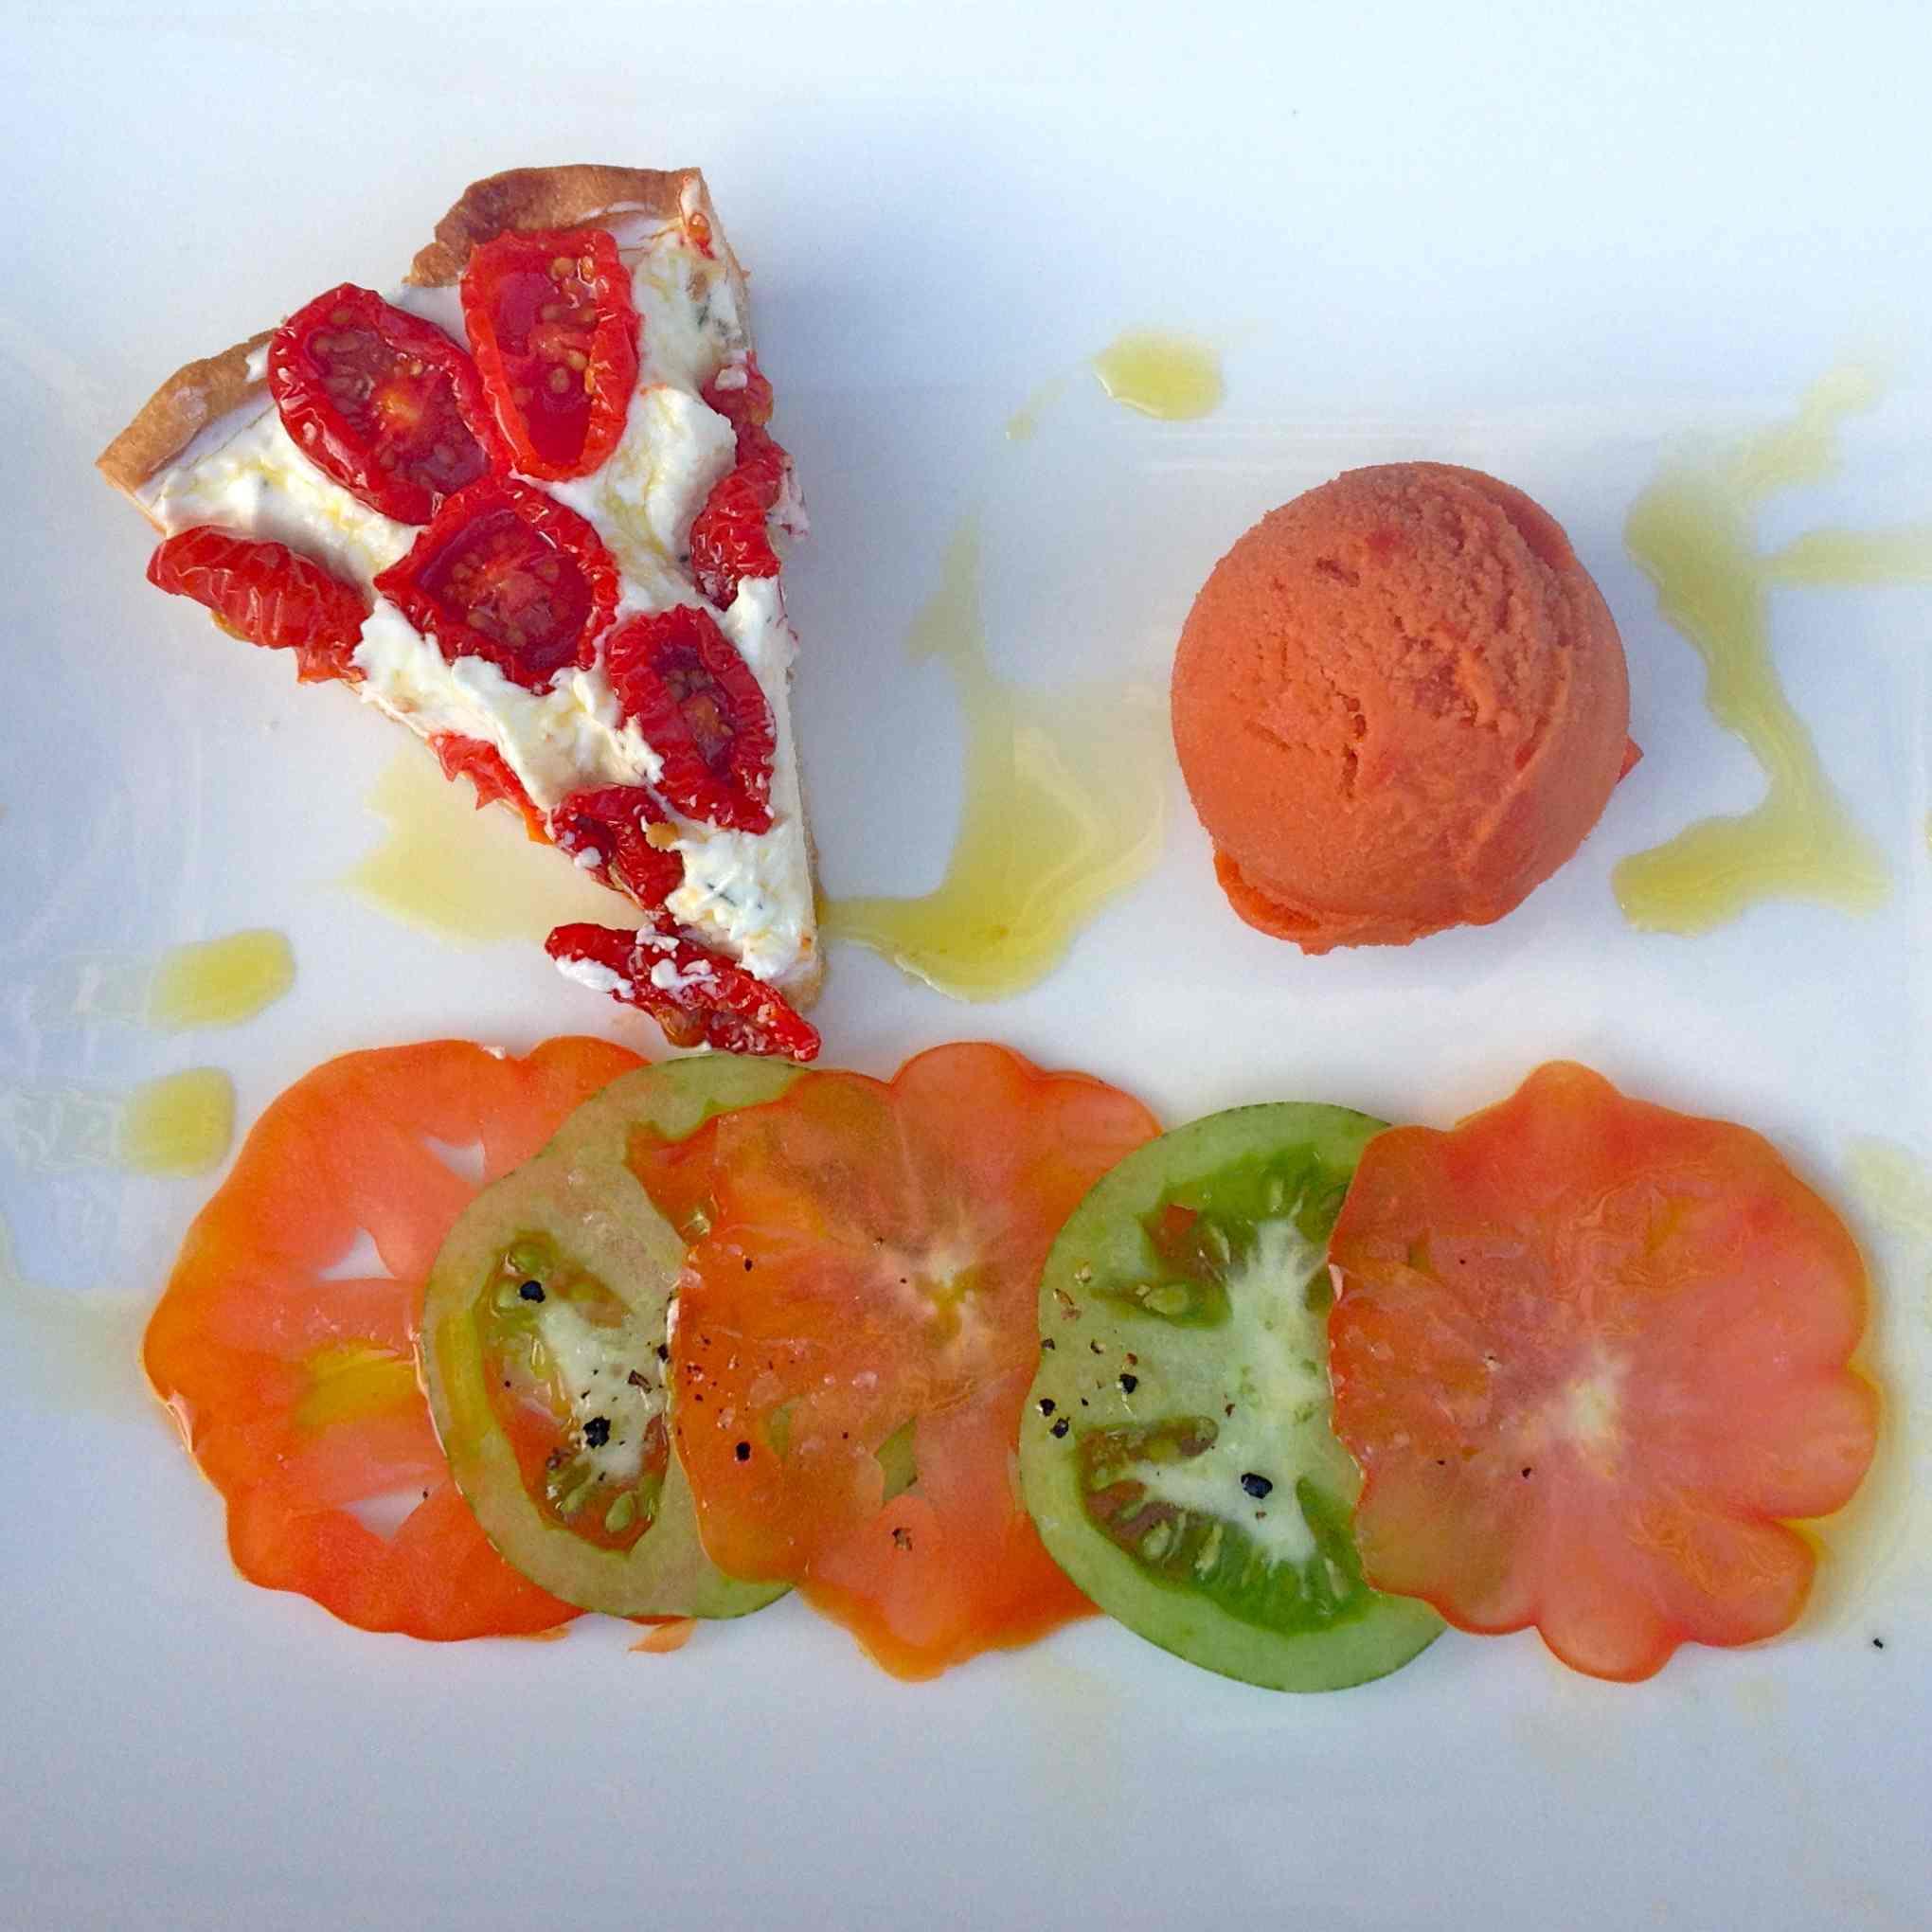 Rotisserie-Weingruen-Berlin-Tomaten